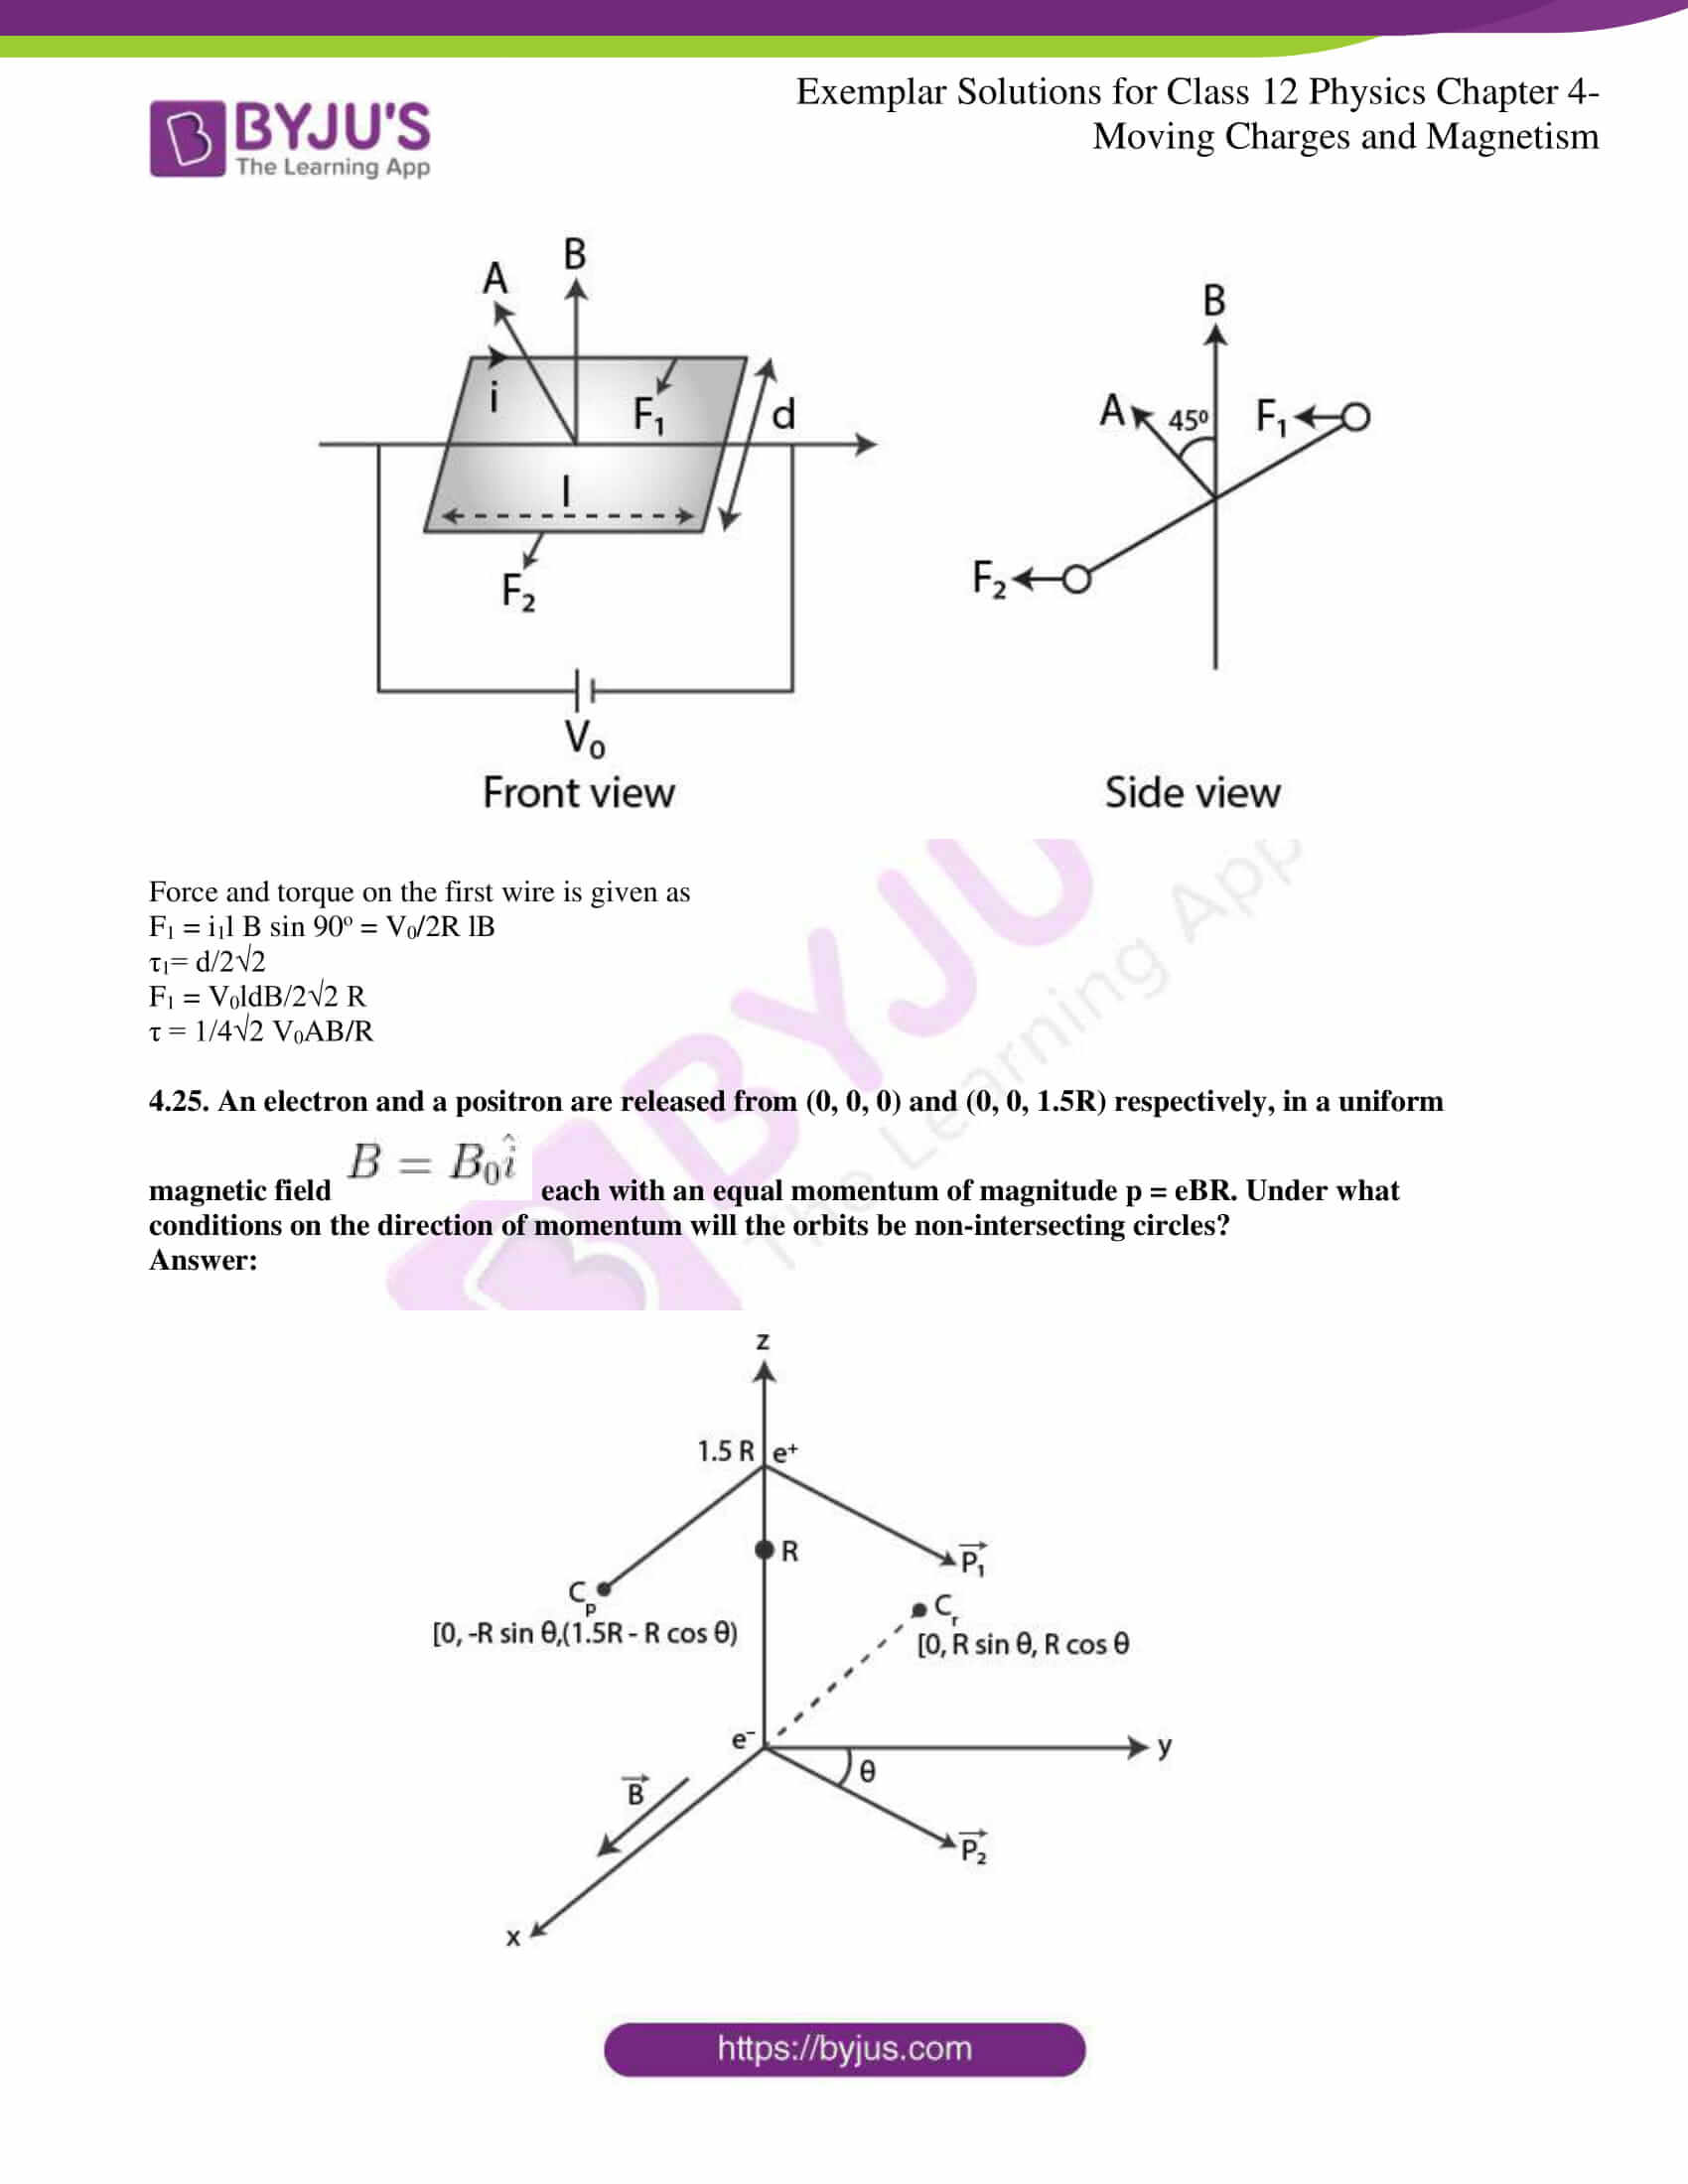 ncert exemplar solutions for class 12 physics chapter 4 08